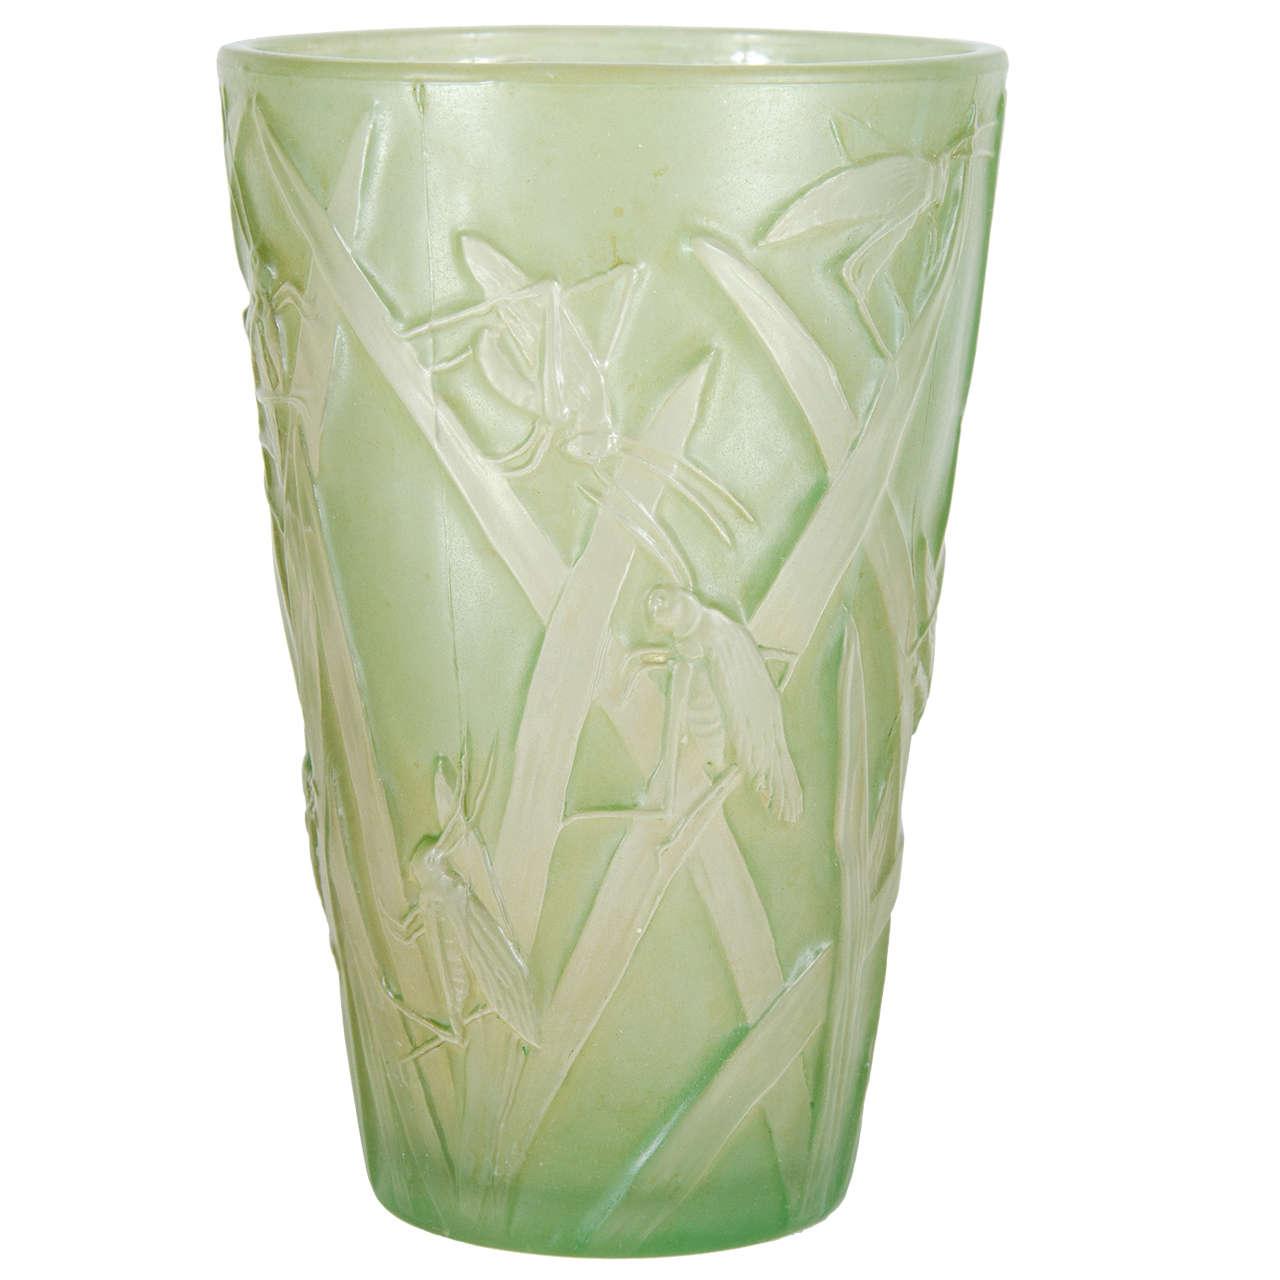 Rare art deco pale celadon grasshopper vase by the phoenix glass rare art deco pale celadon grasshopper vase by the phoenix glass company for sale reviewsmspy